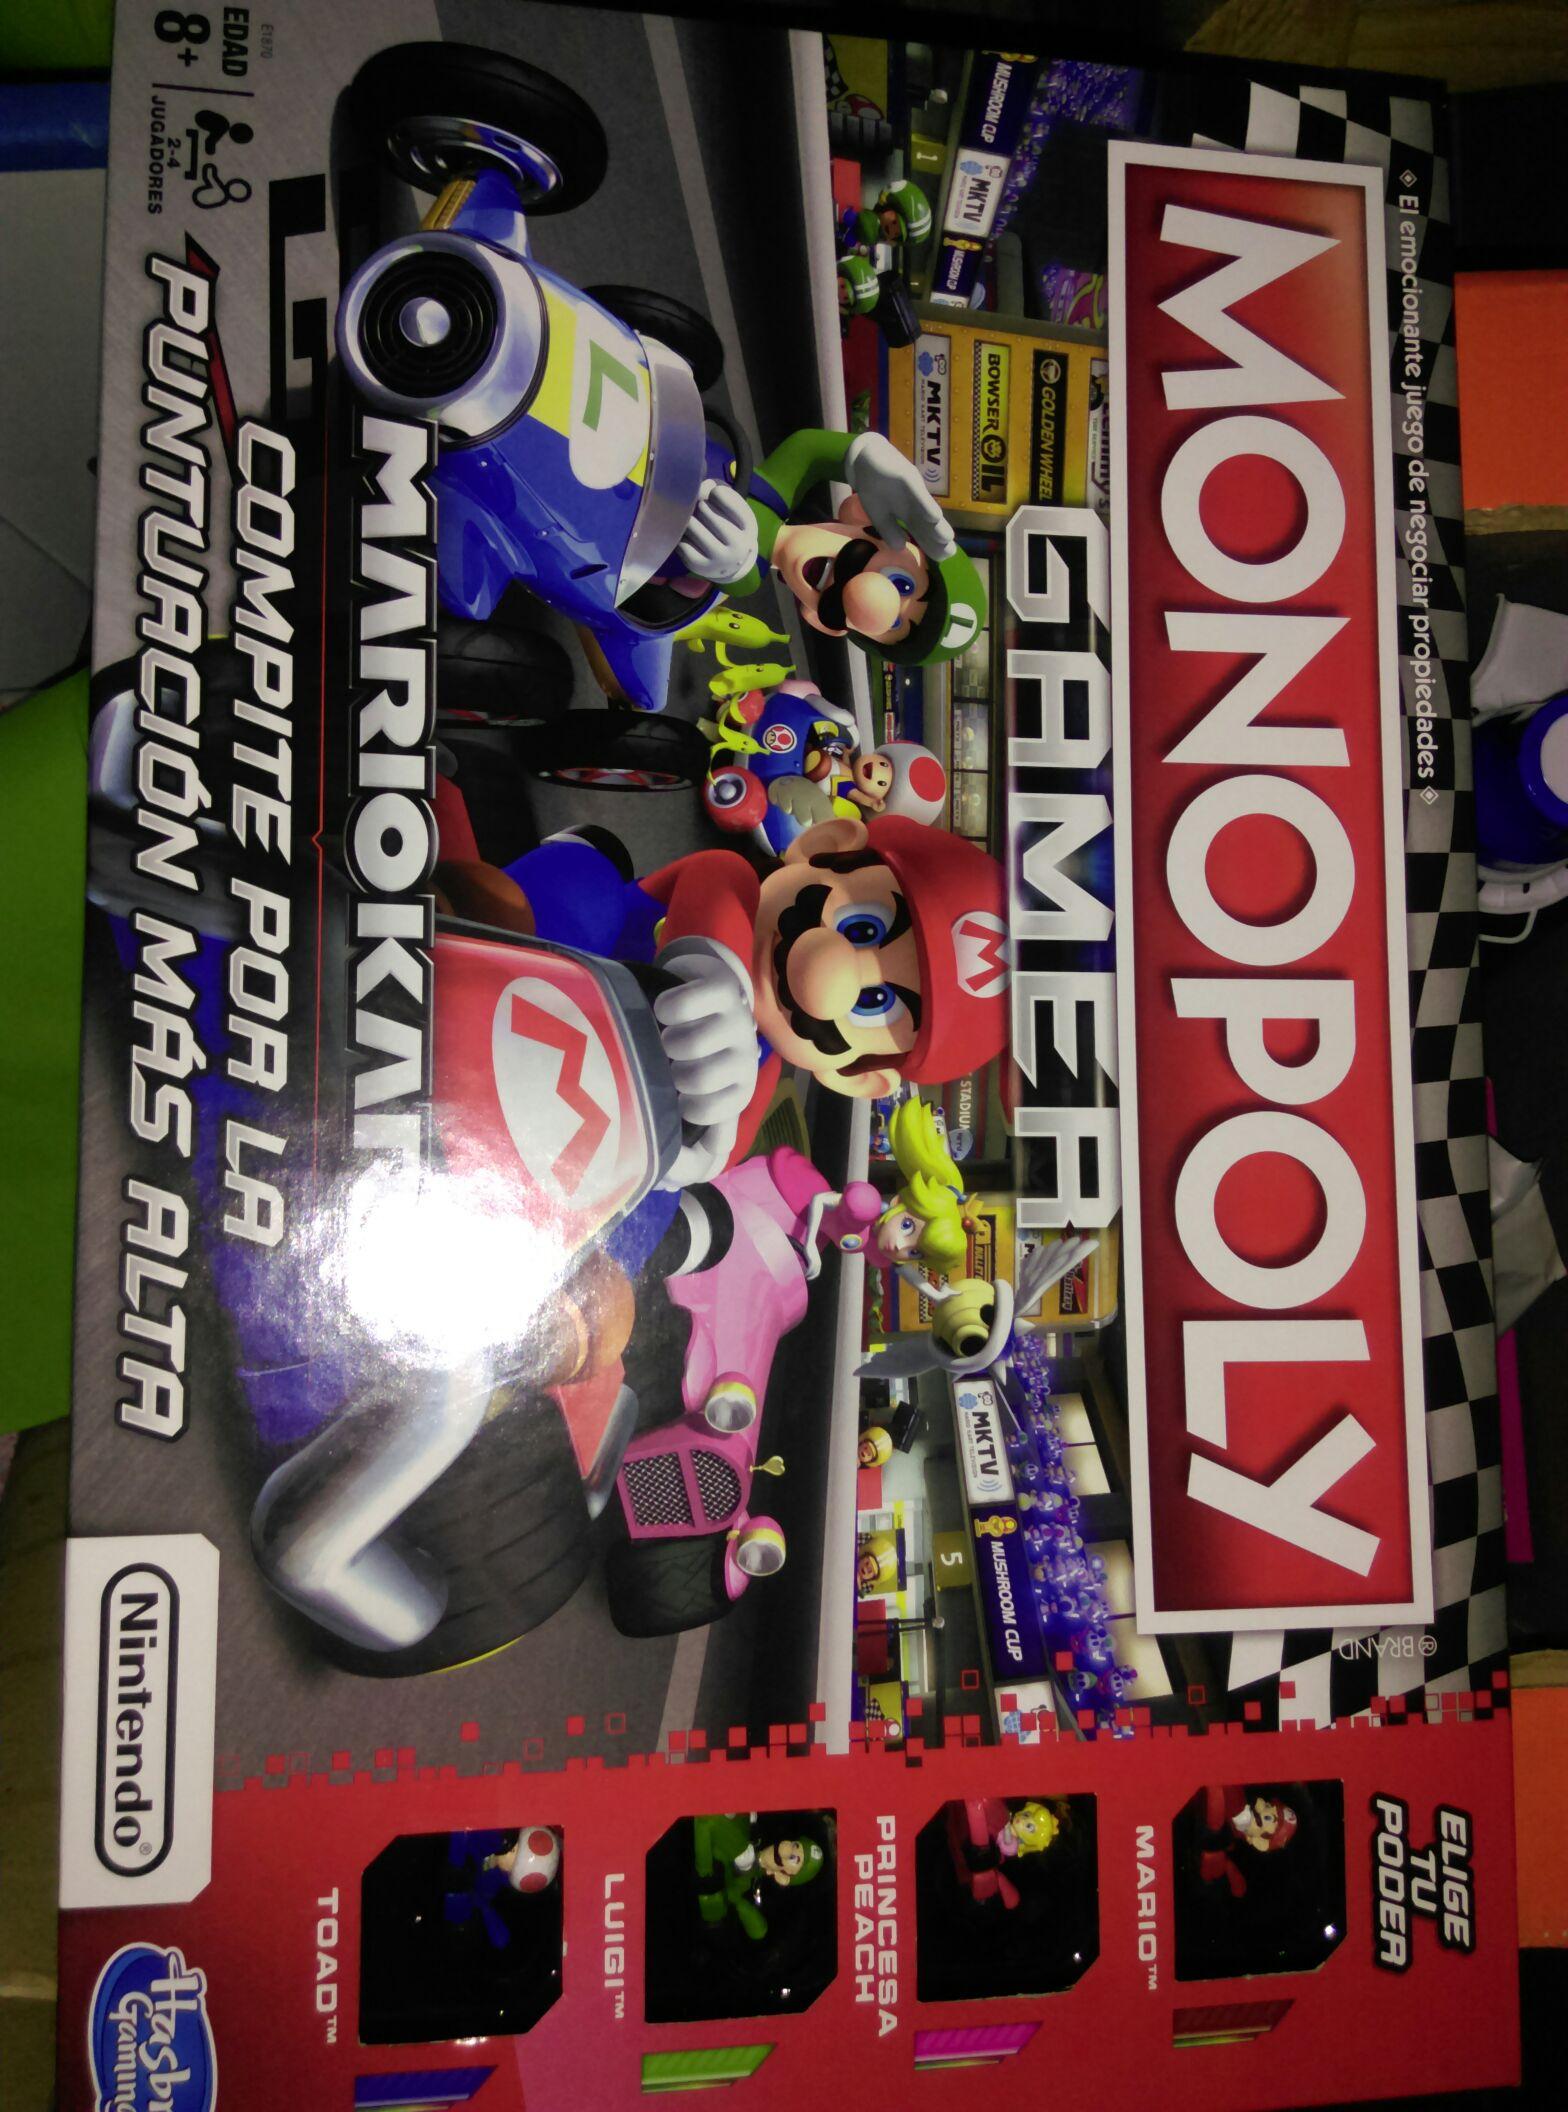 Bodega Aurrerá: Monopoly Gamer Mario Kart